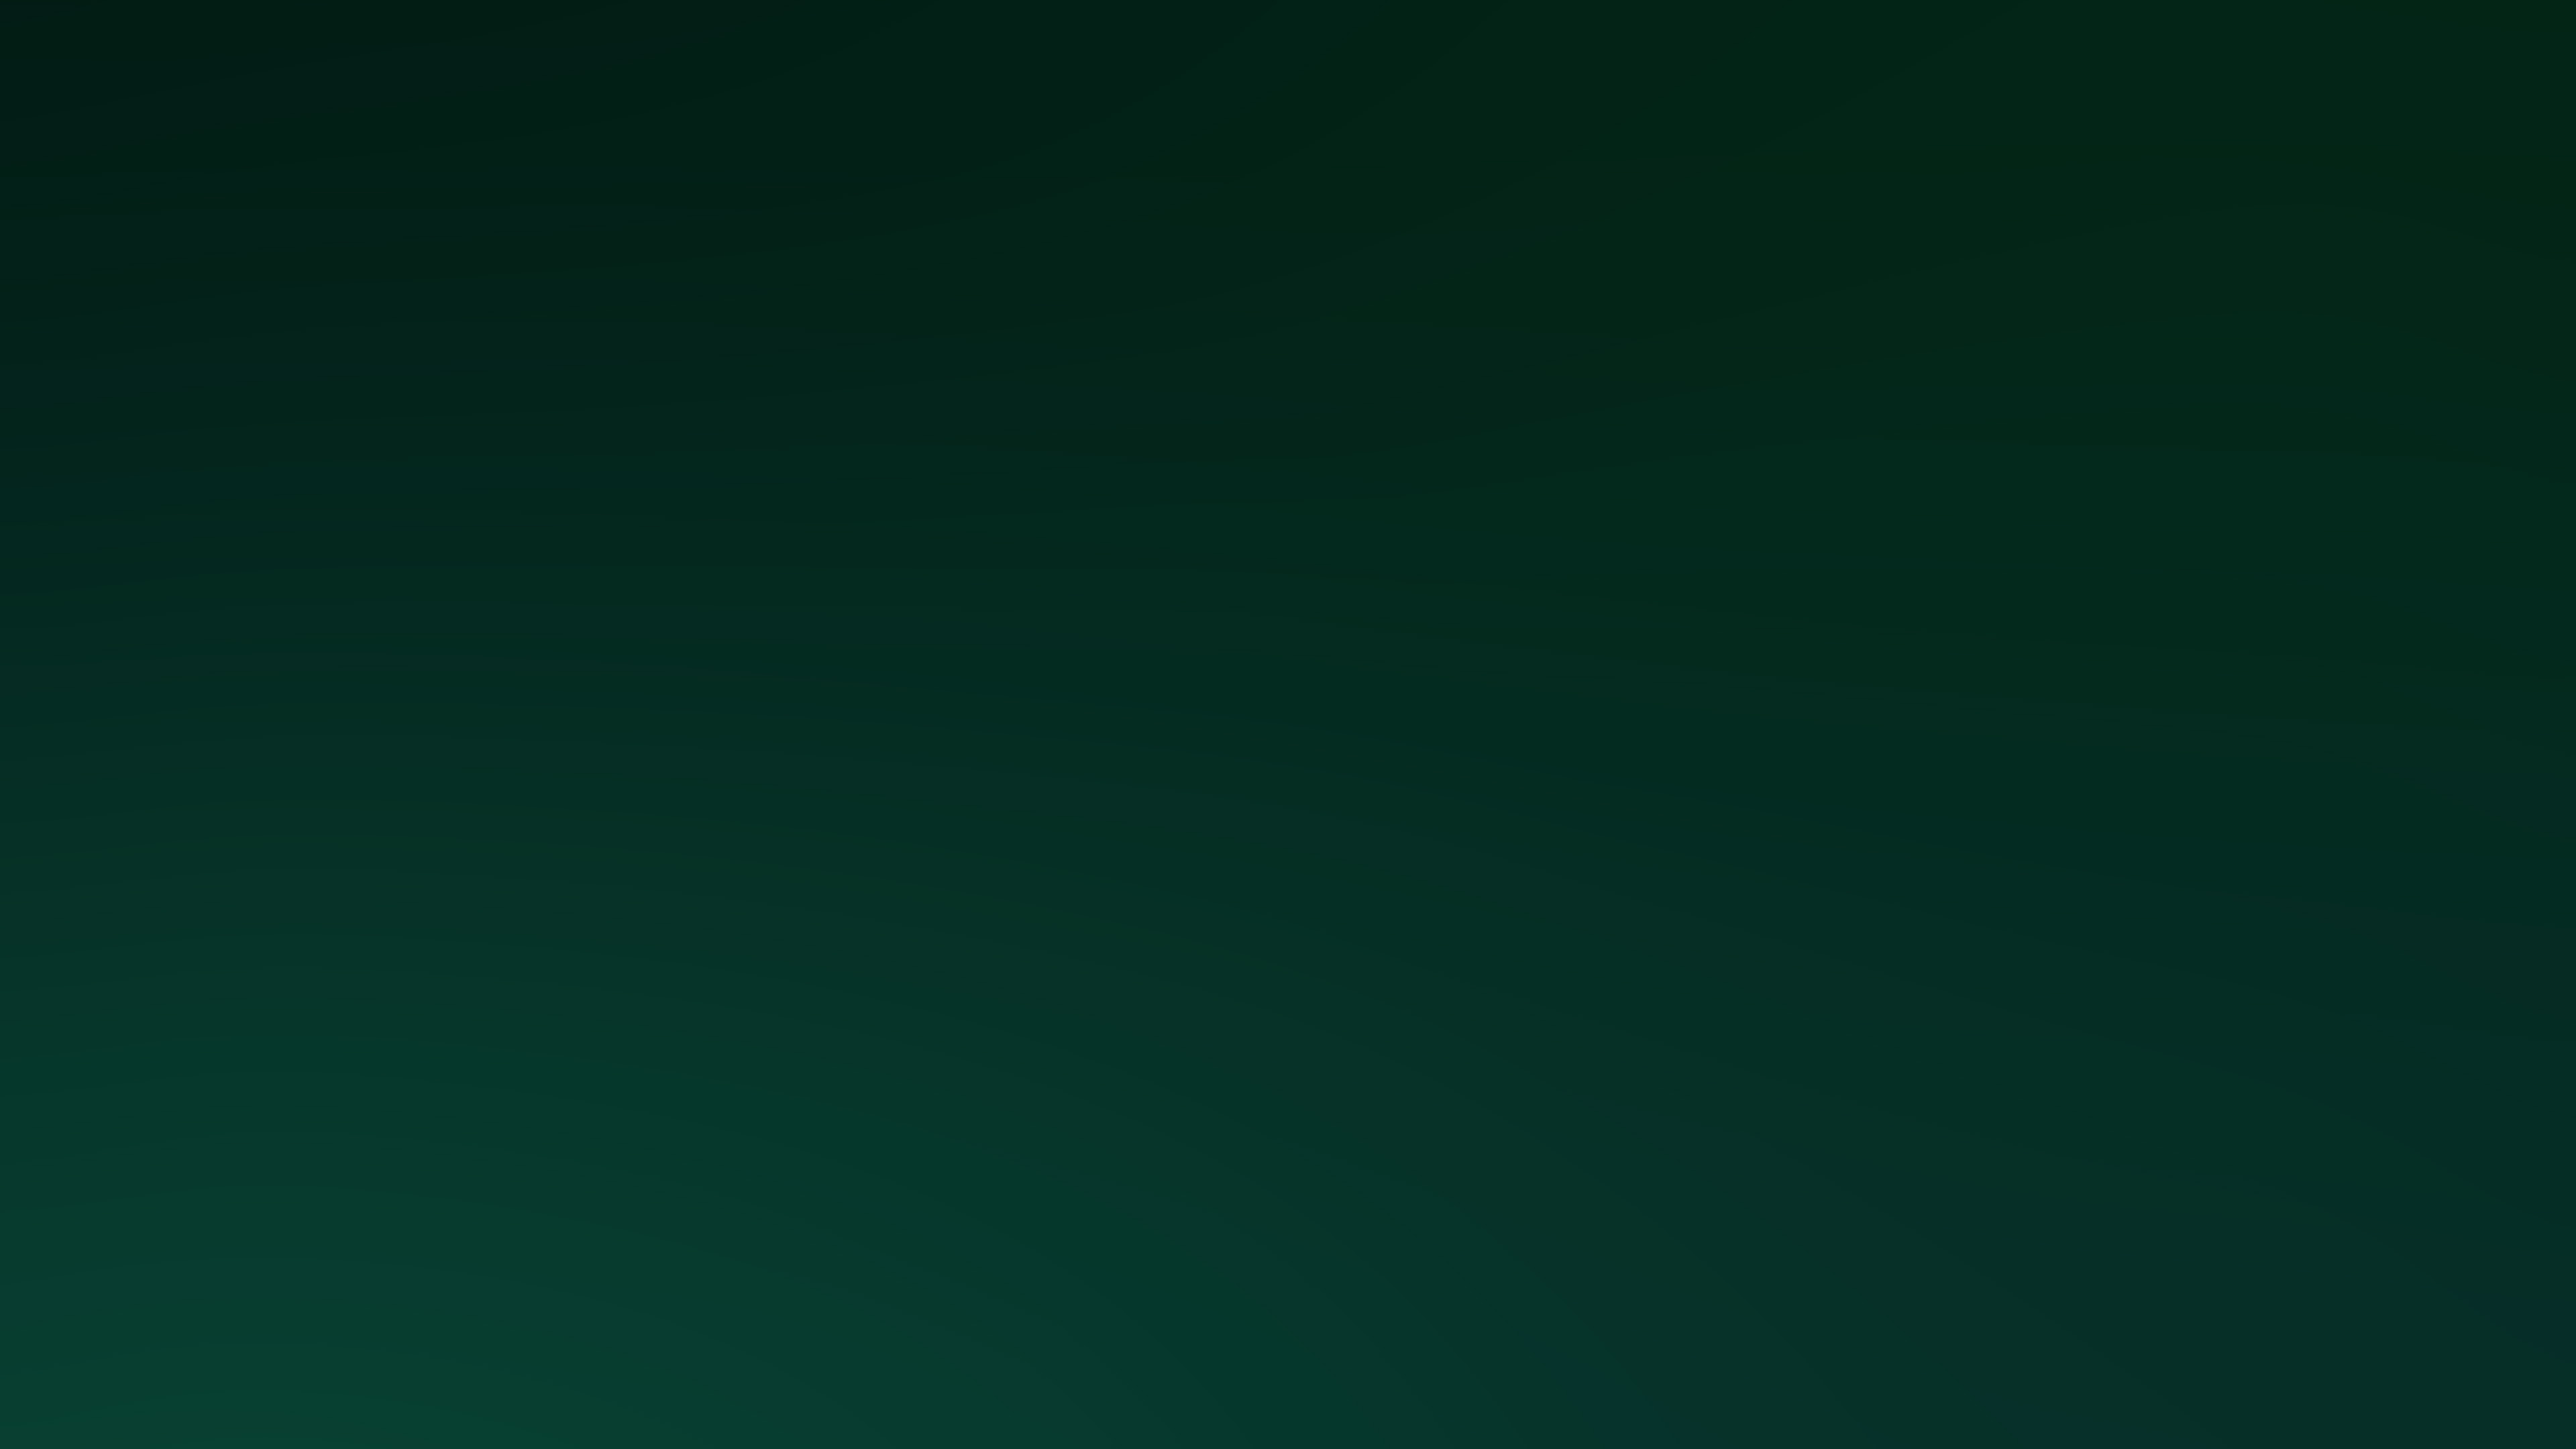 4k Fall Wallpaper For Phone Sk64 Dark Green Blur Gradation Wallpaper